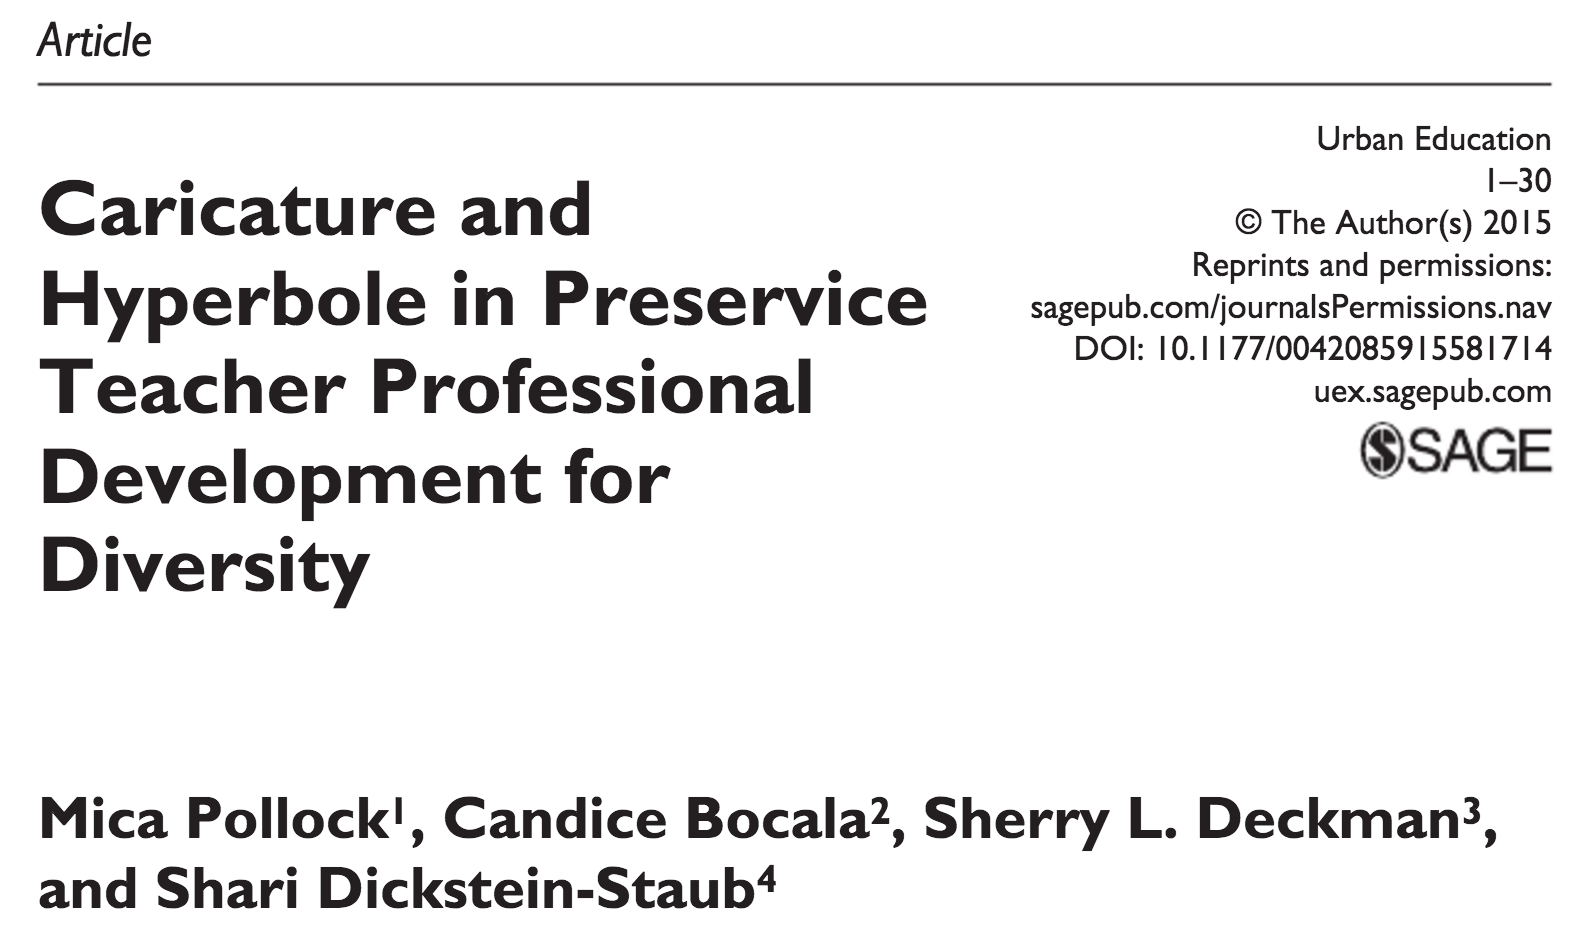 Caricature and Hyperbole in Preservice Teacher Professional  Development for Diversity.